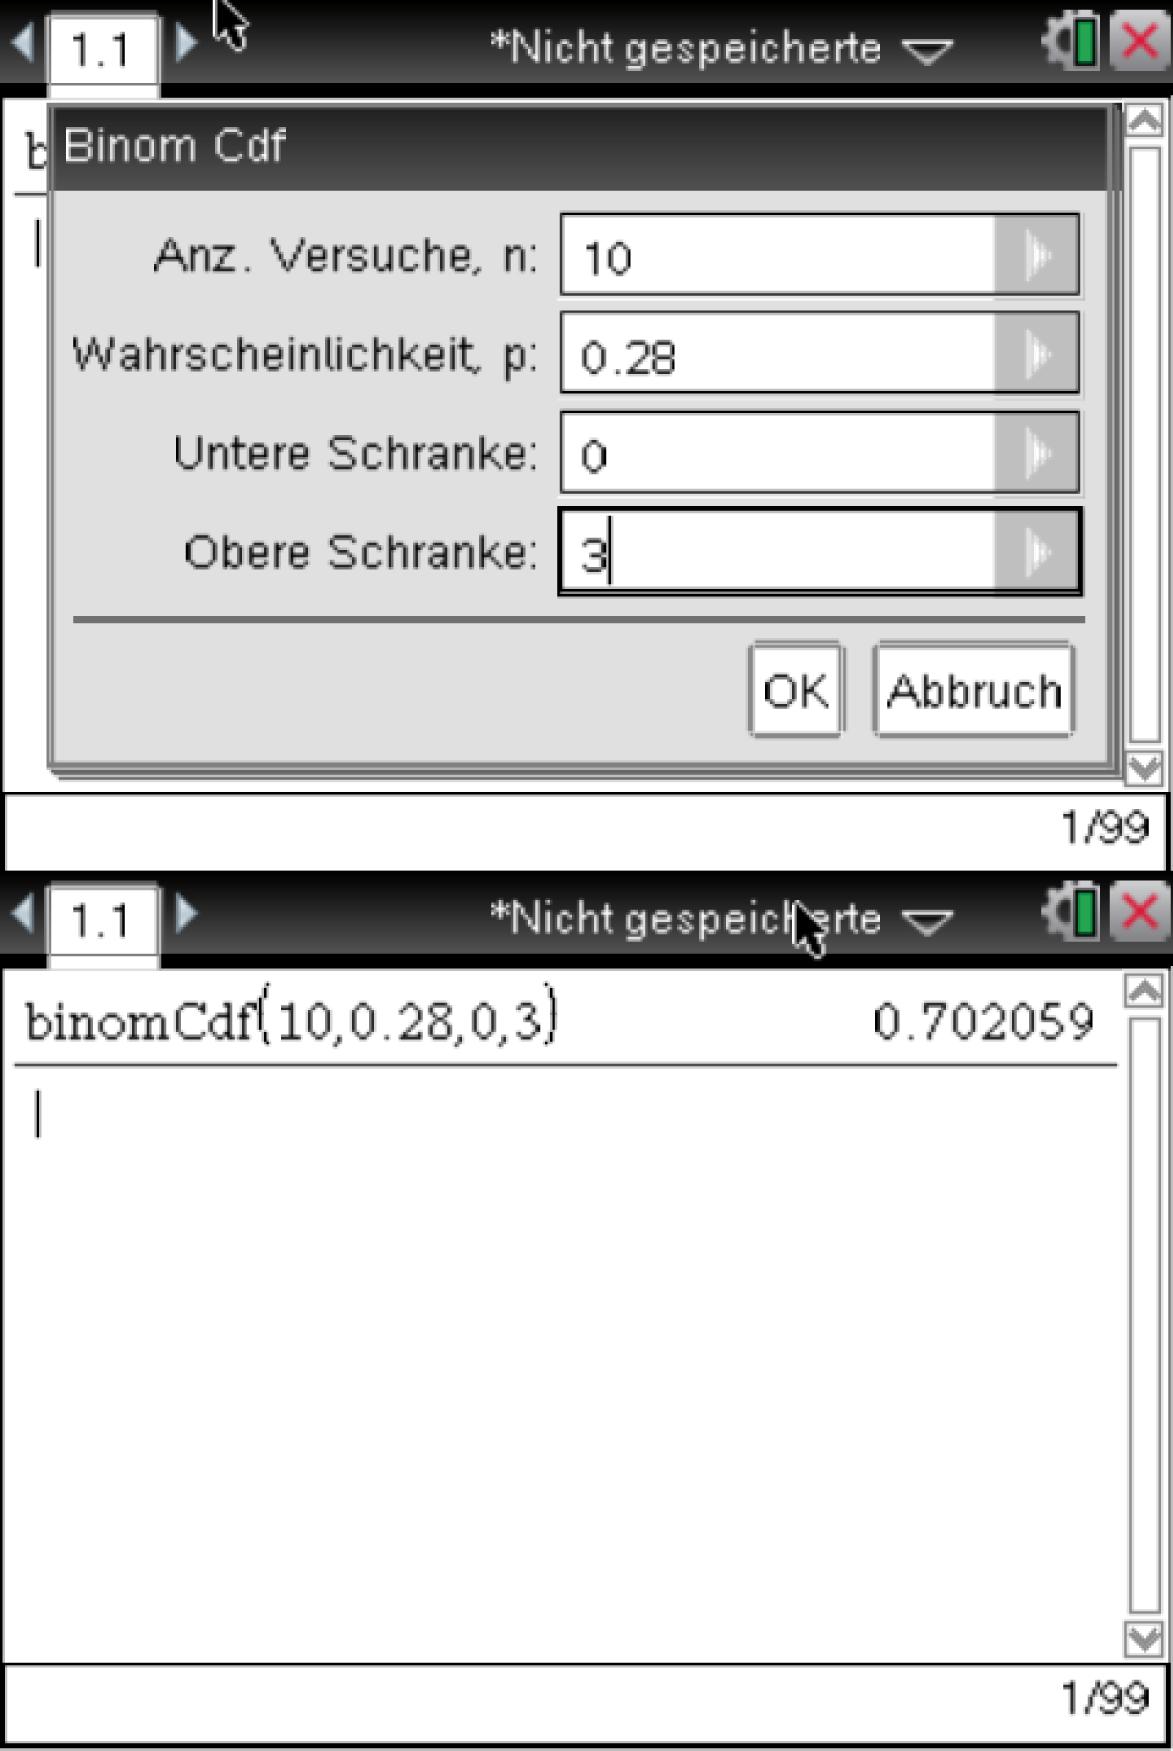 c1 stochastik mathe abi 2015 in hessen berufl. Black Bedroom Furniture Sets. Home Design Ideas